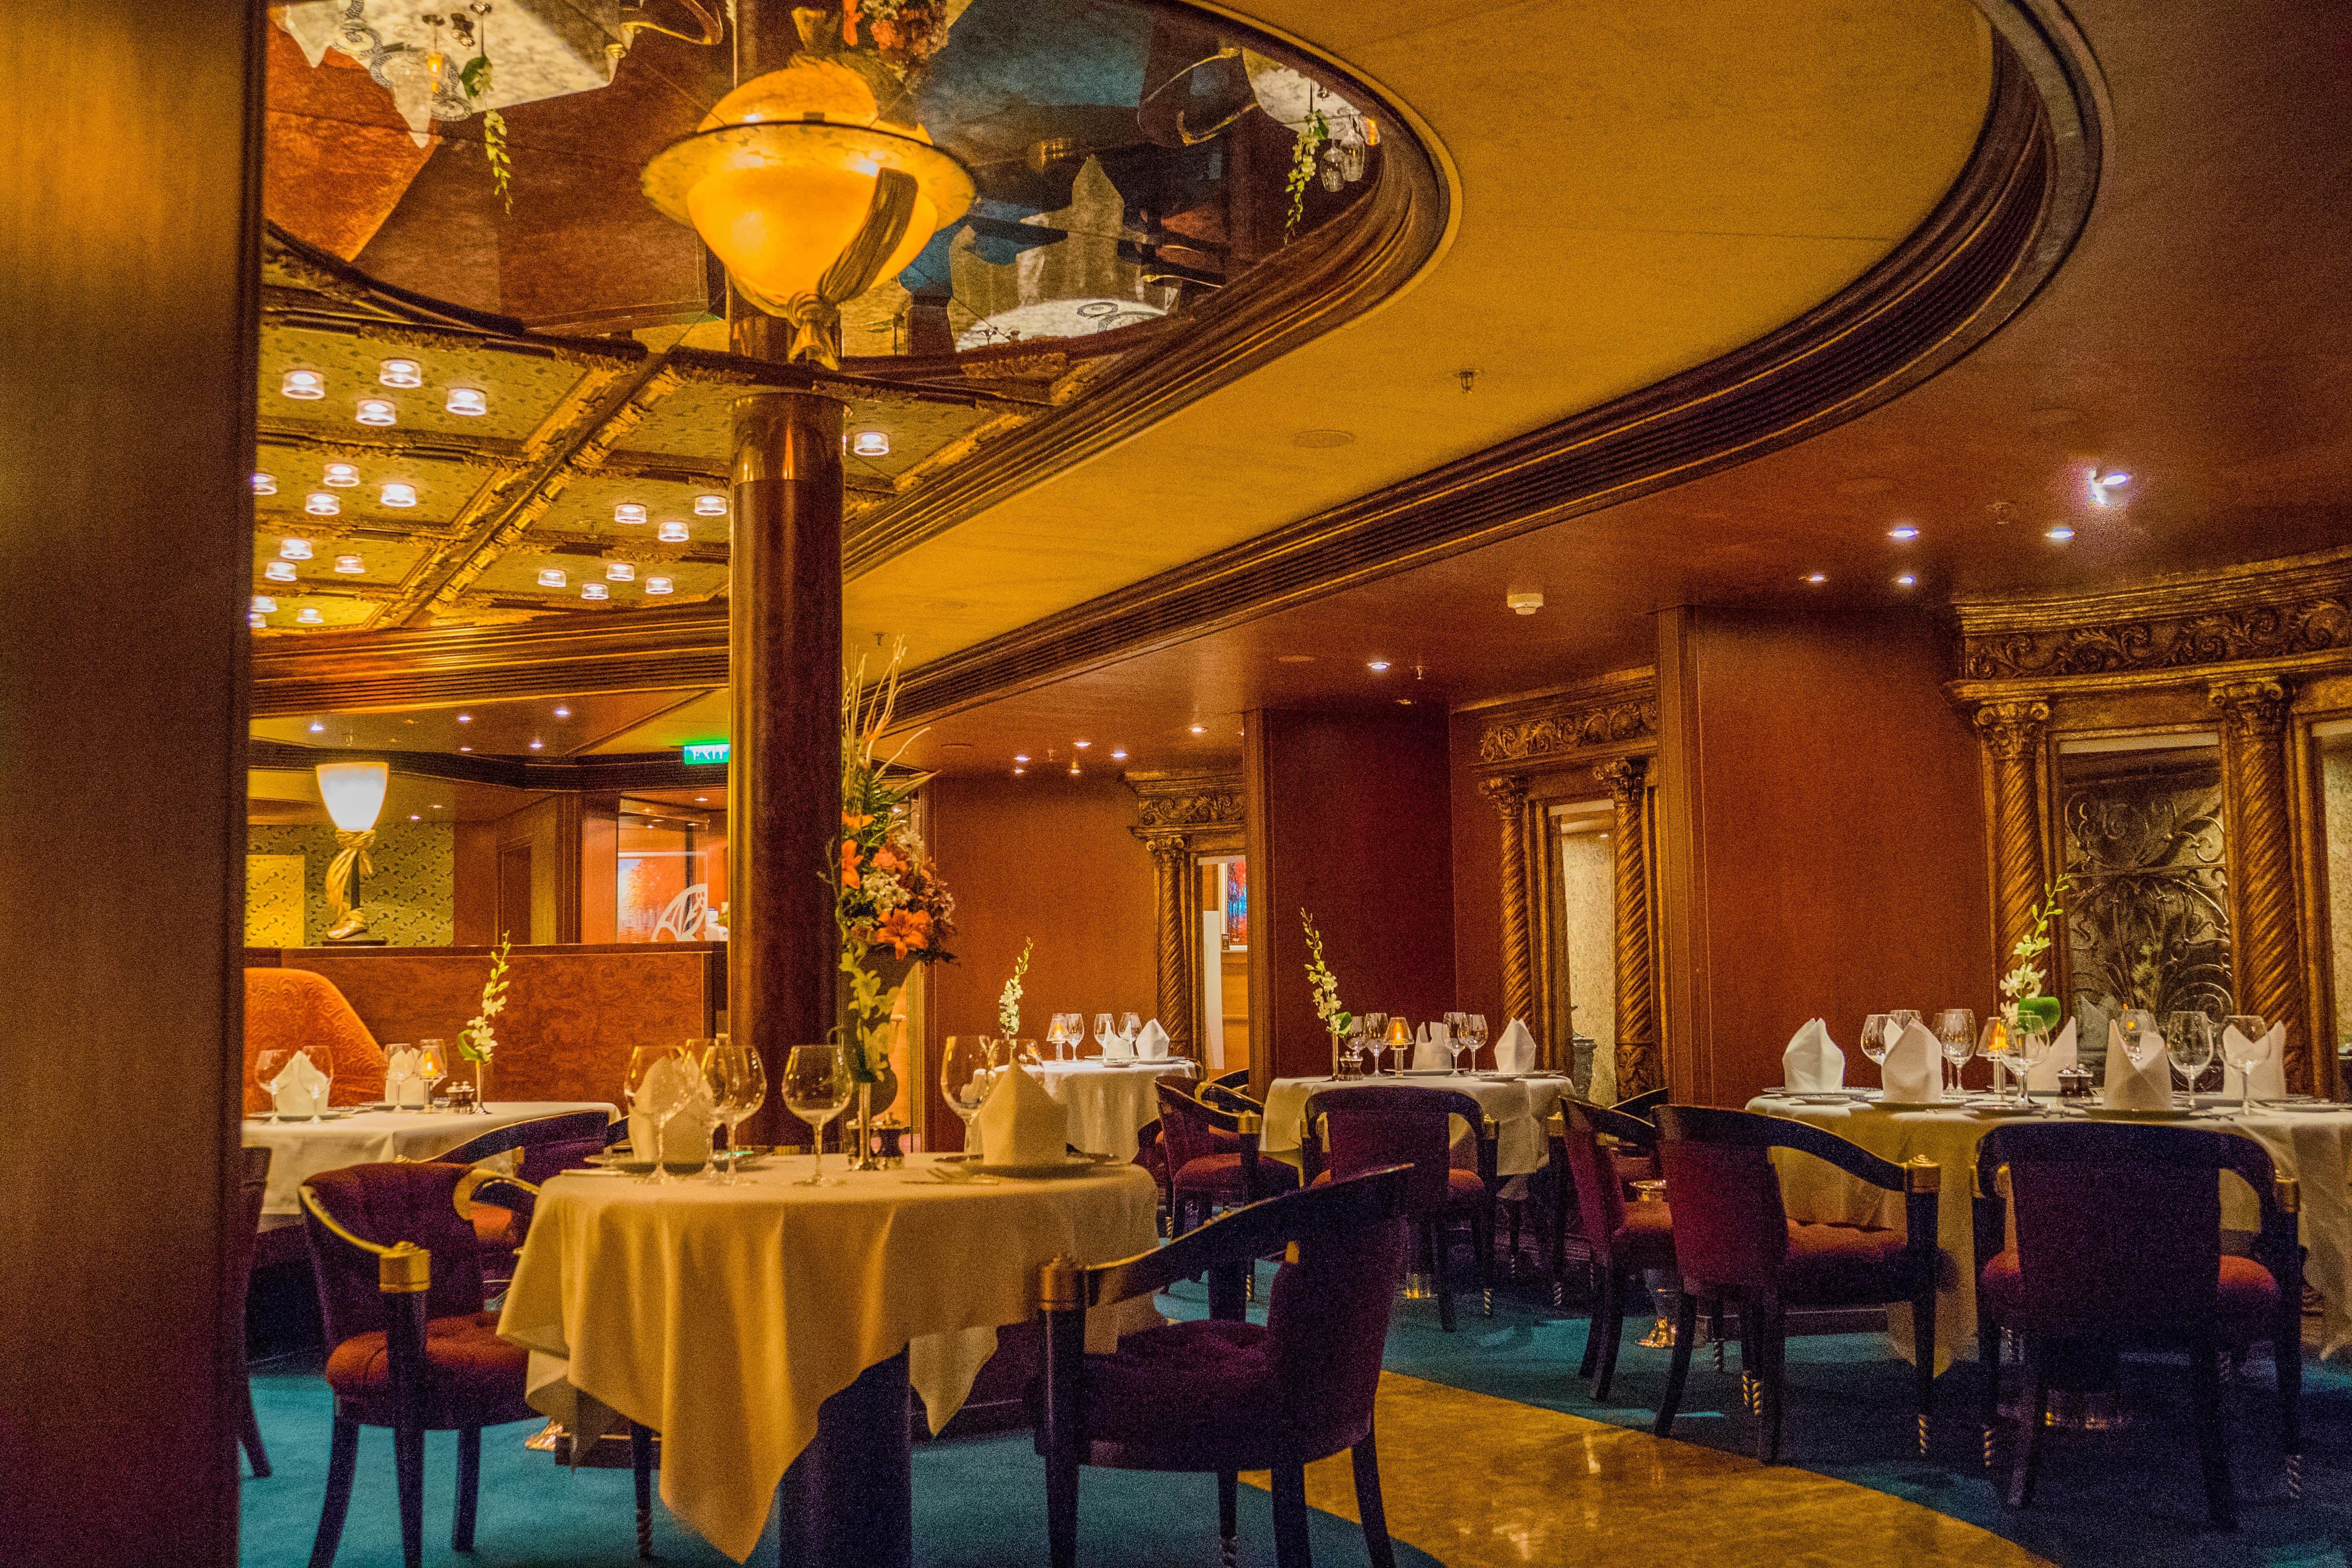 Fotos gratis : arquitectura, interior, restaurante, palacio, comida ...